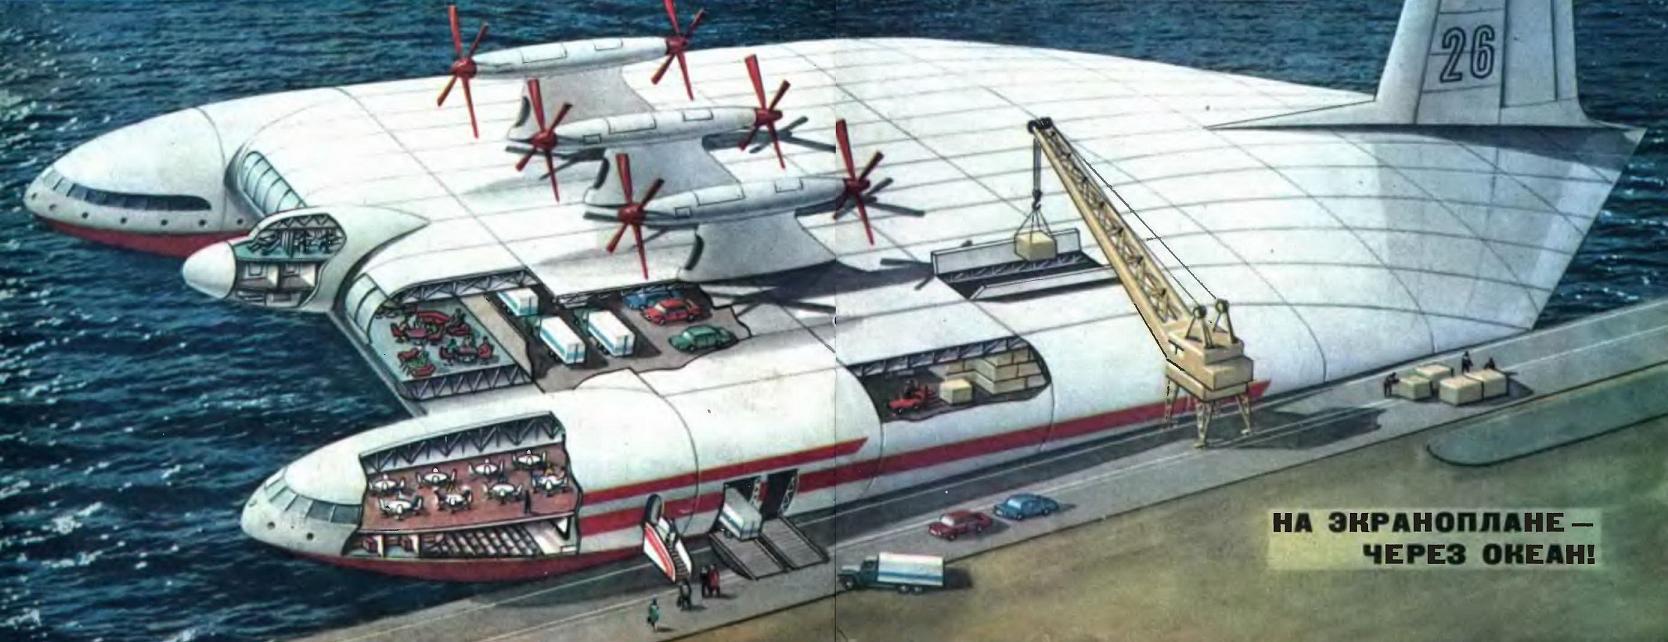 Ekranoplan -  the dream of the Soviet